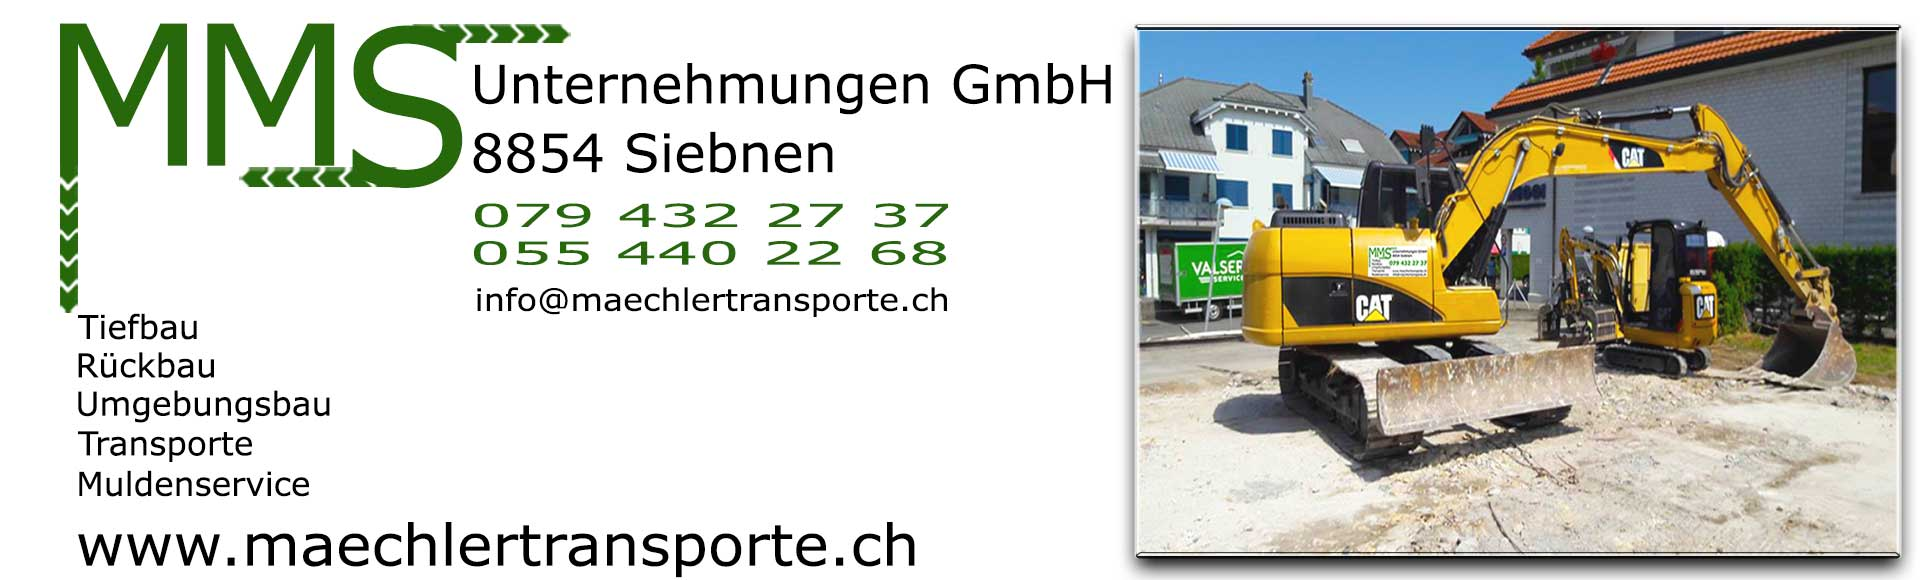 Maechlertransporte MMS